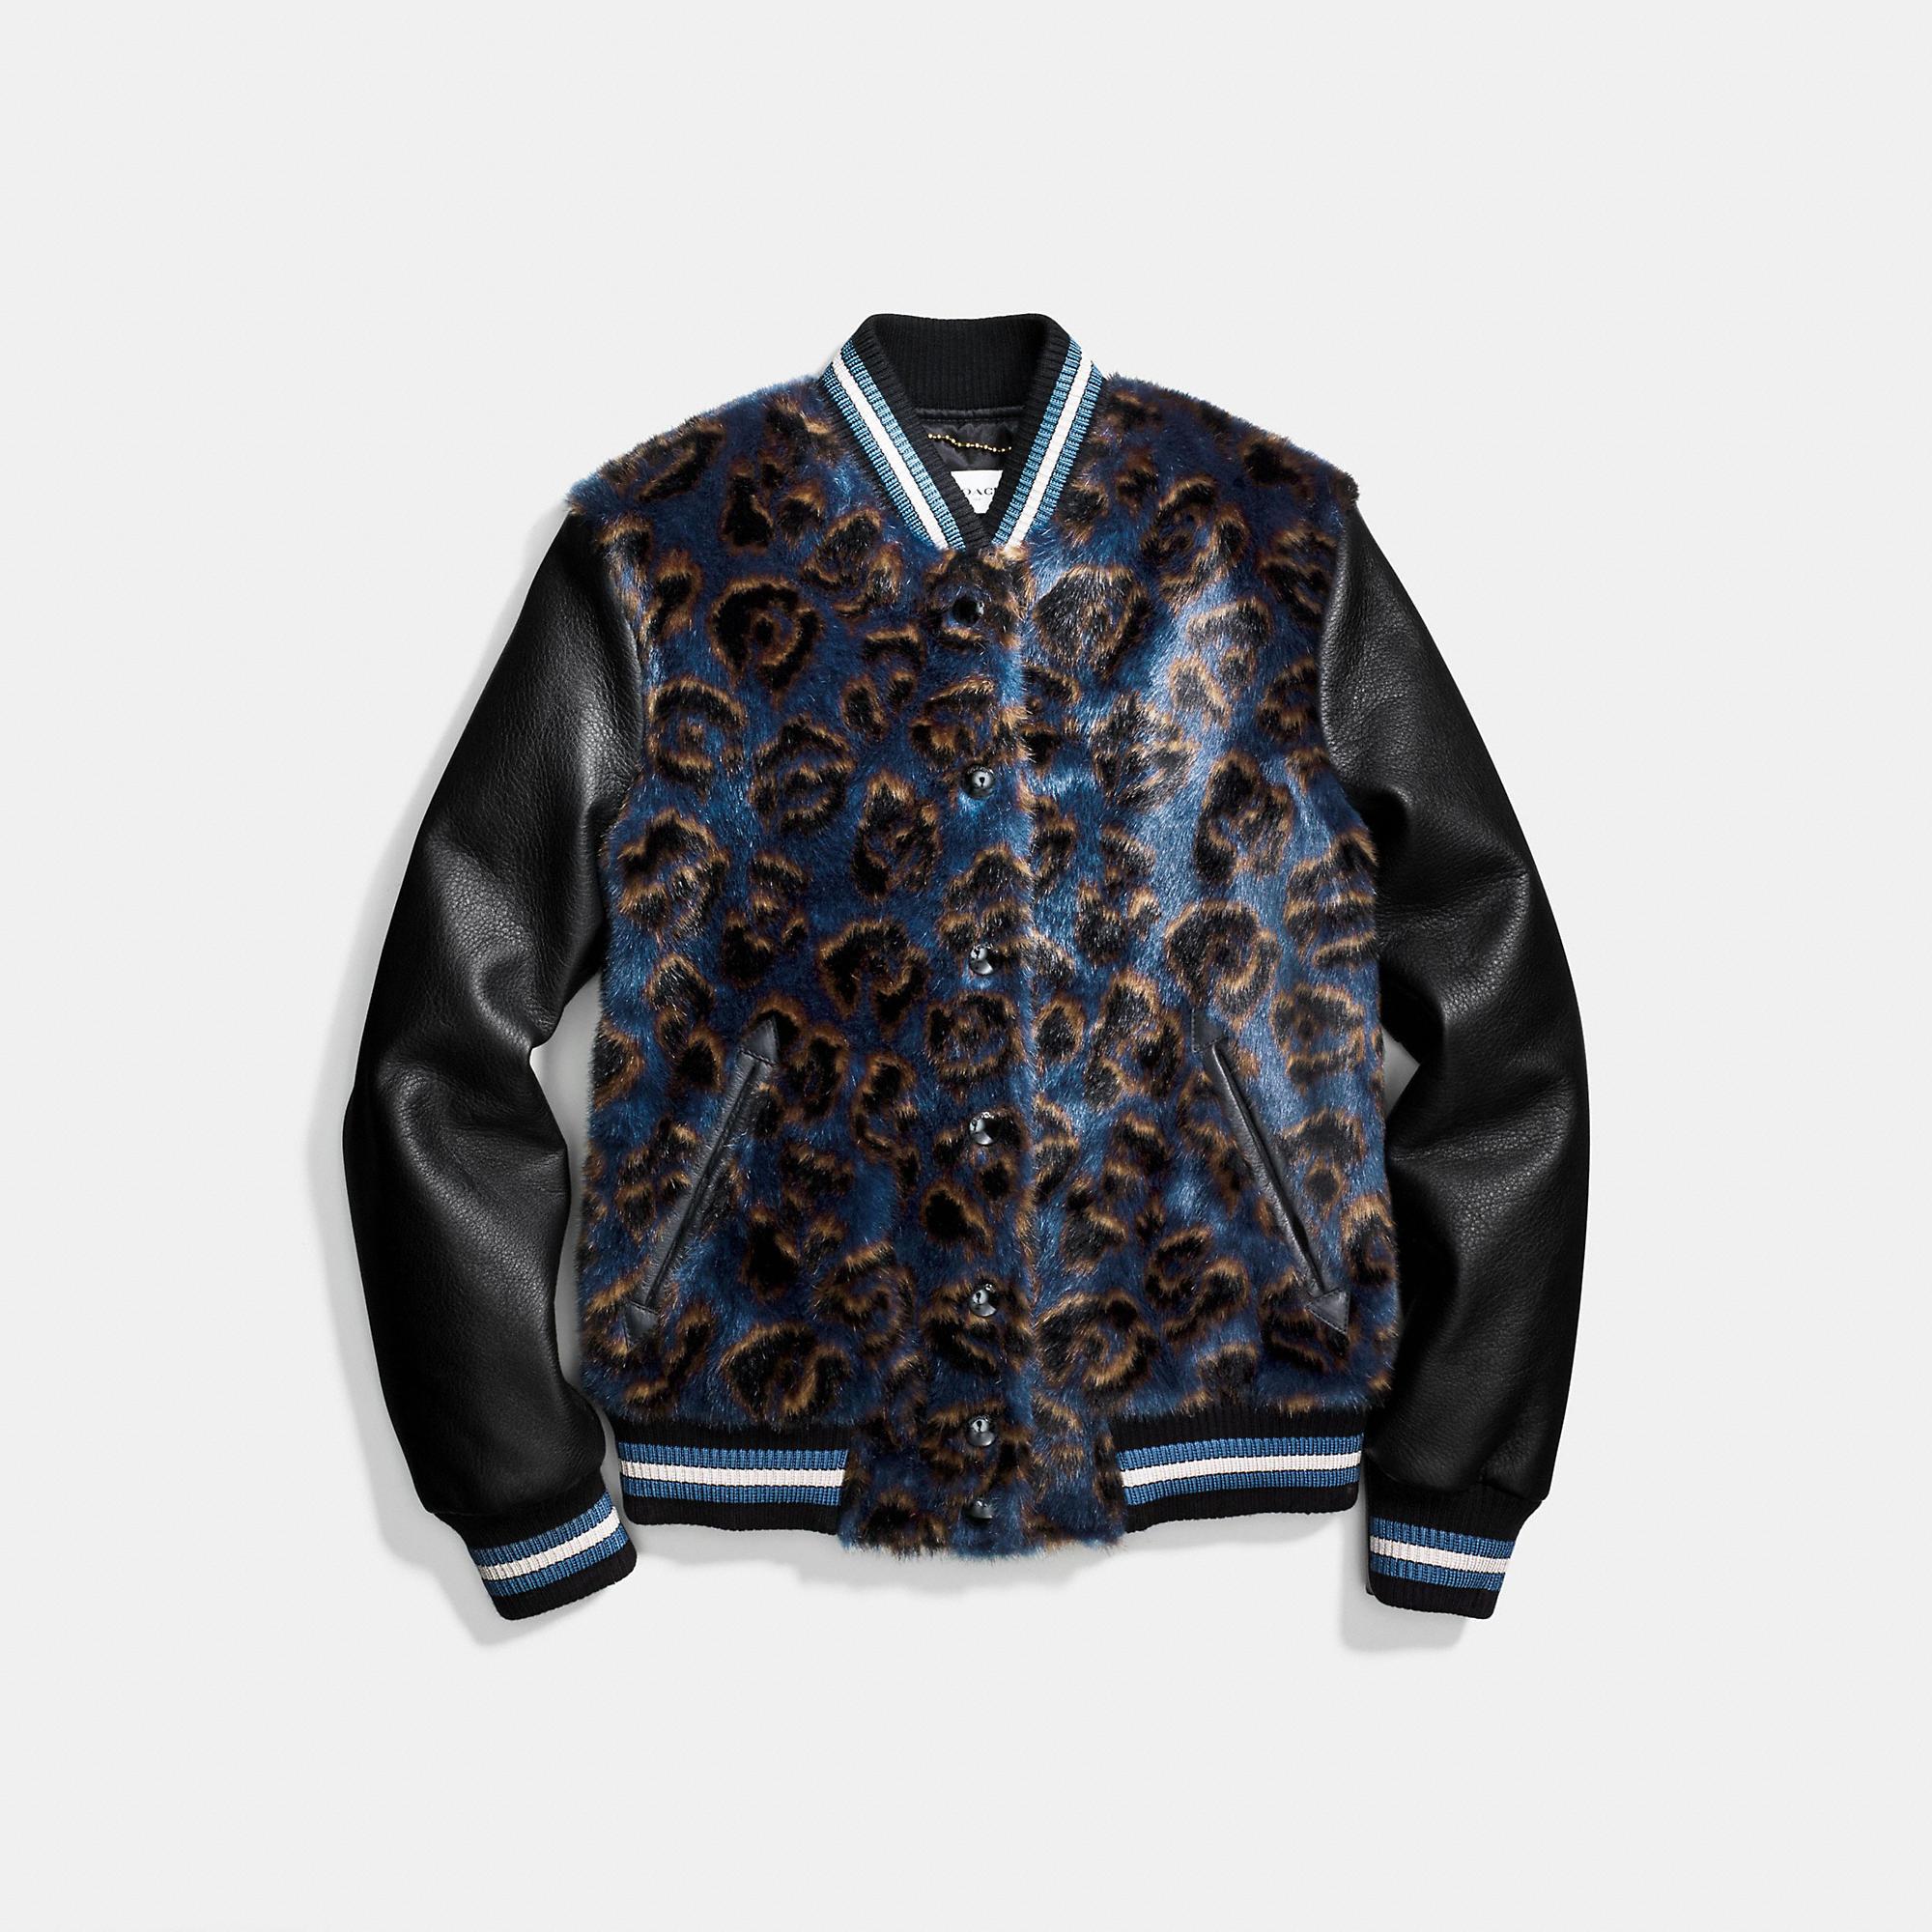 Coach Wild Beast Varsity Jacket